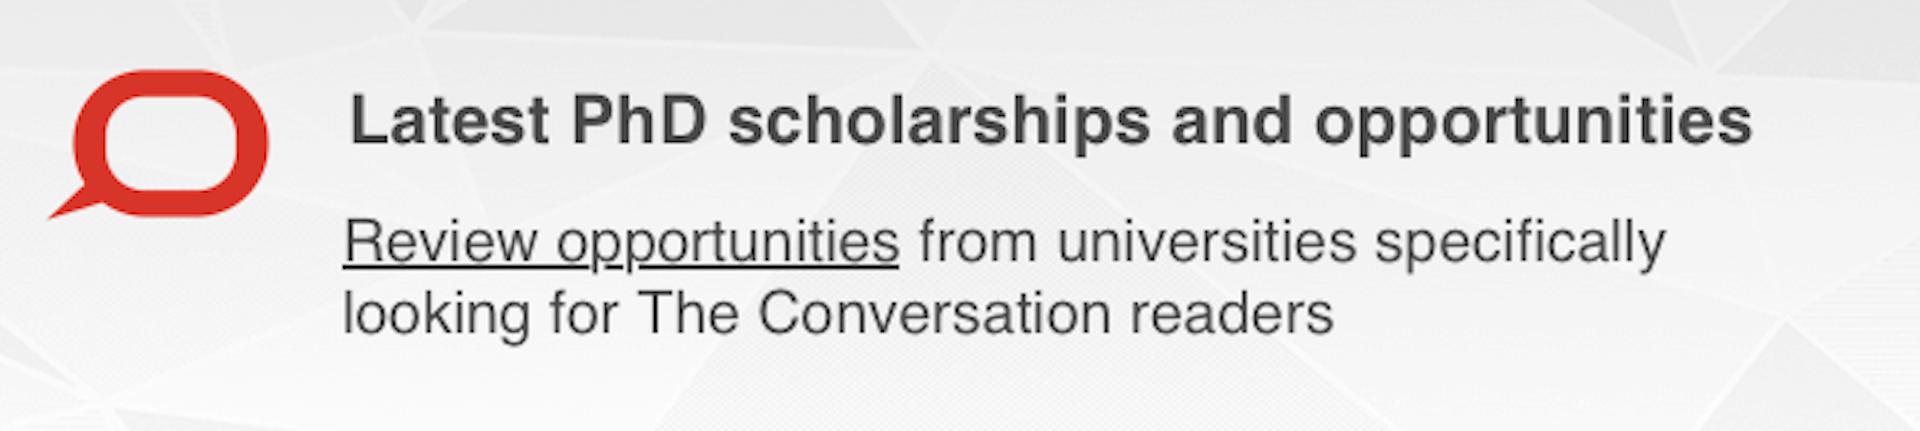 PhD scholarships